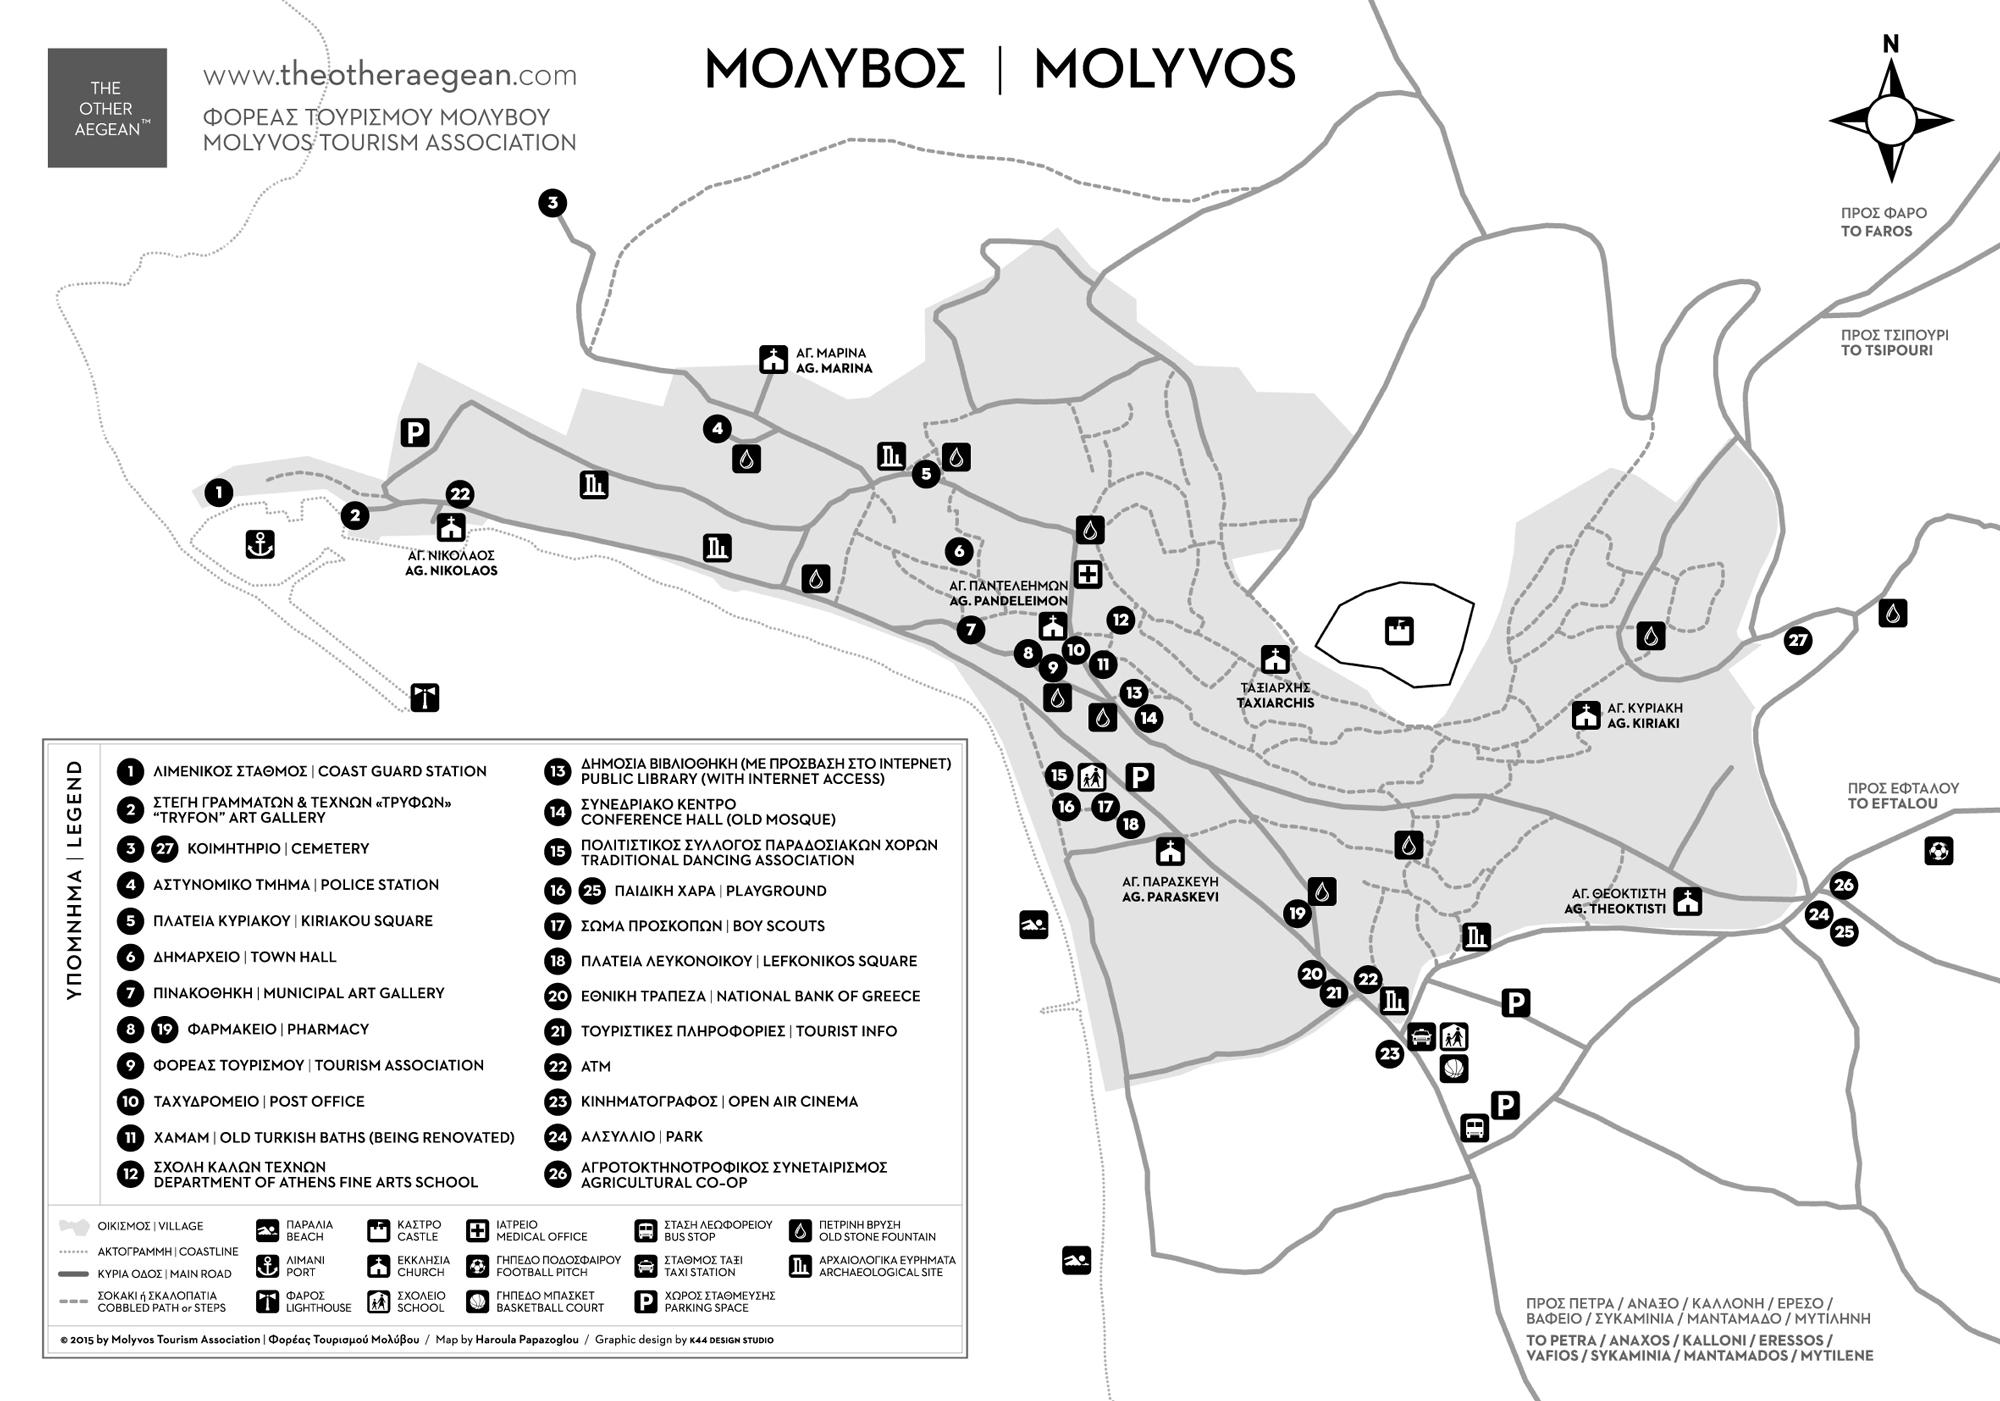 Molyvos_map_2015